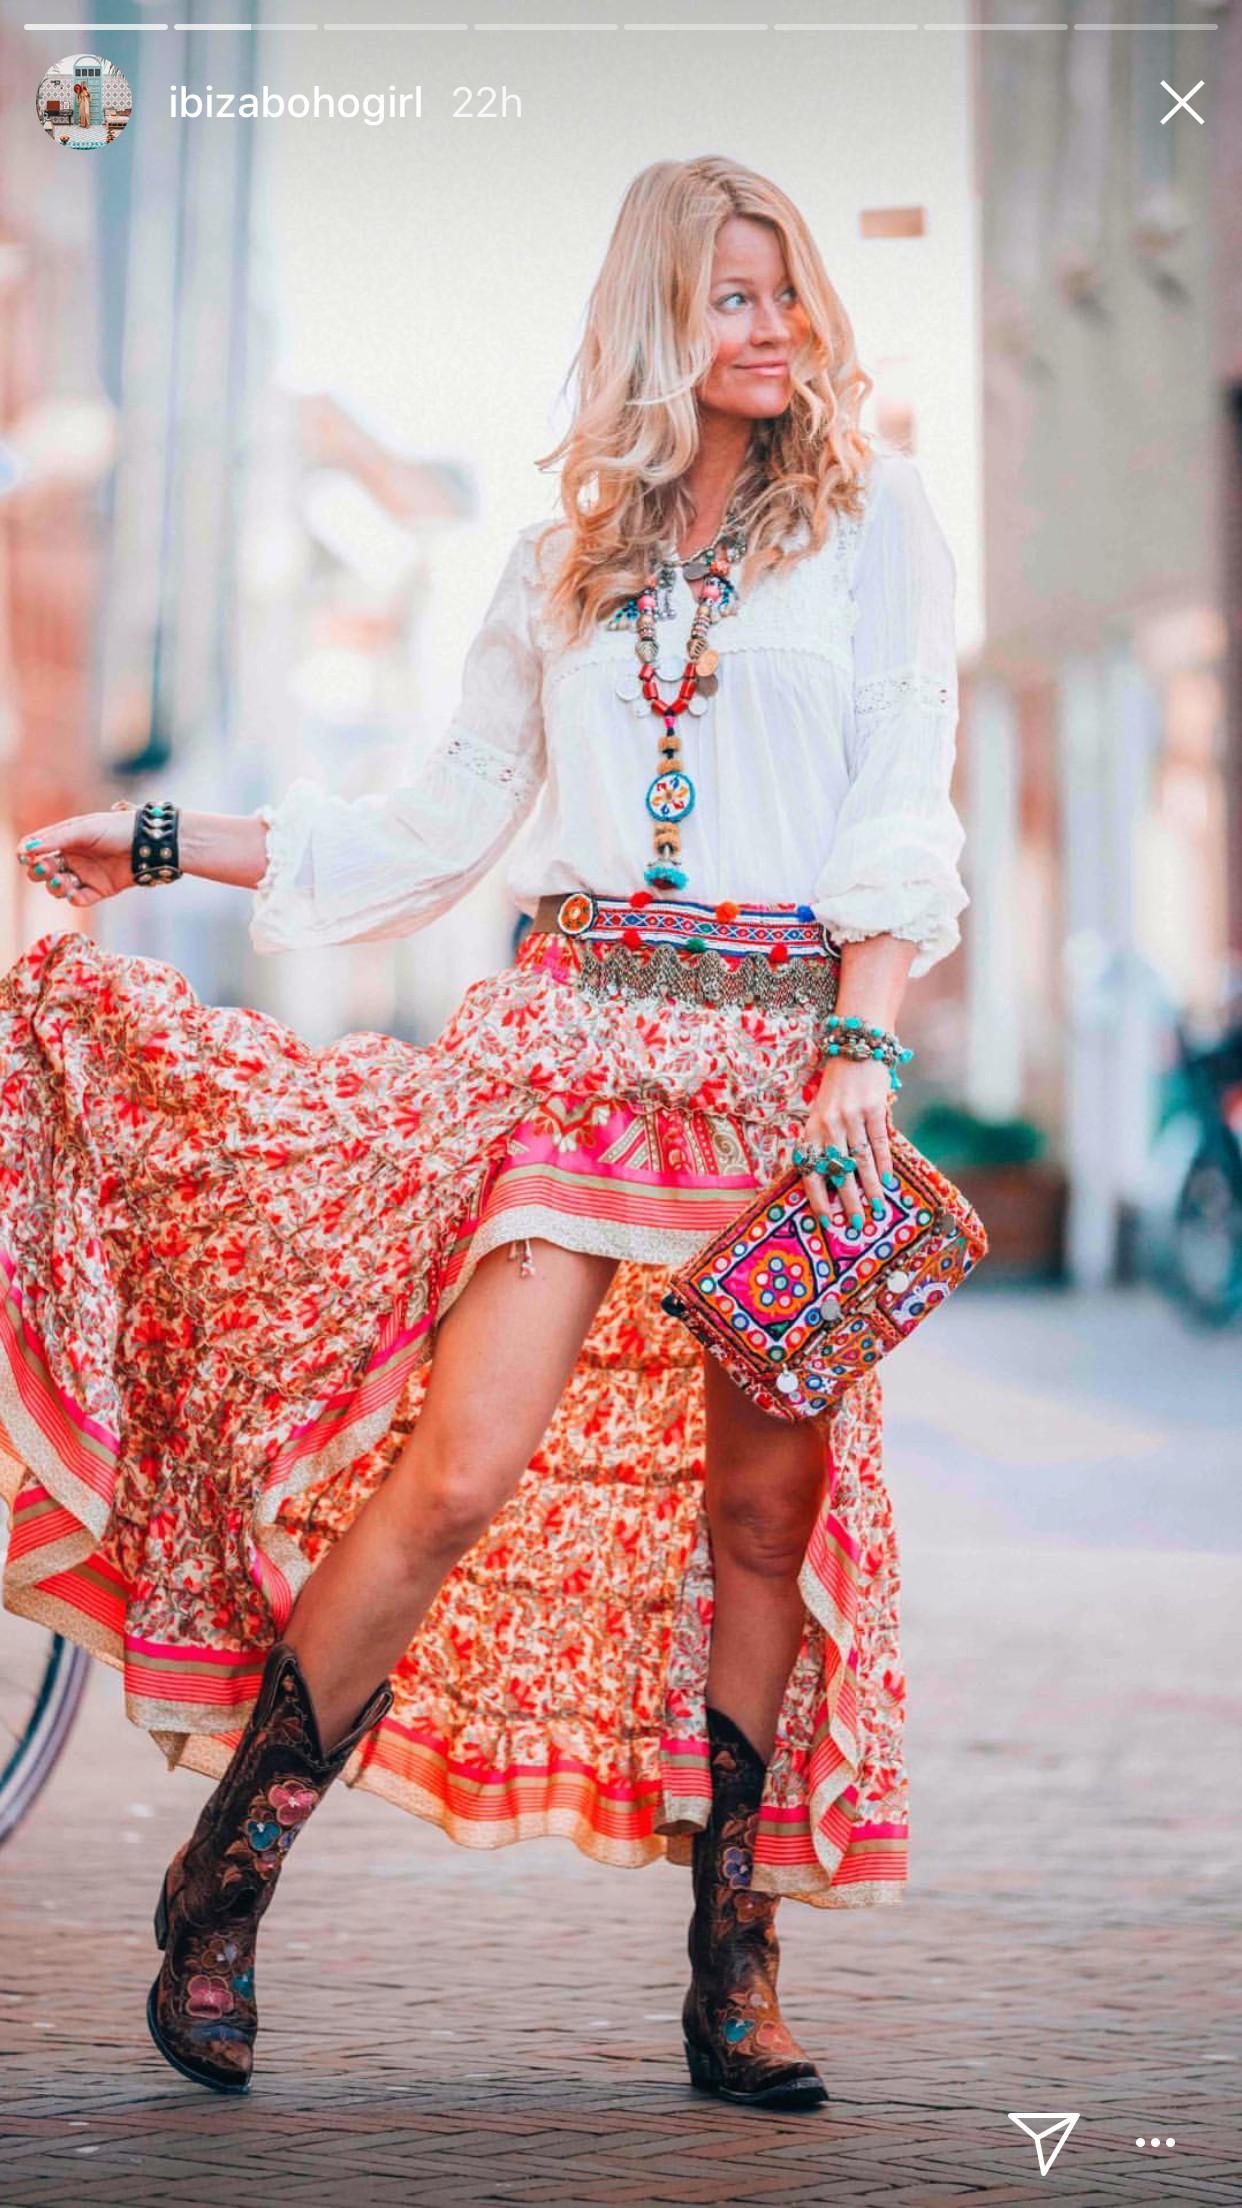 Cowboy boots outfit boho, Bohemian style